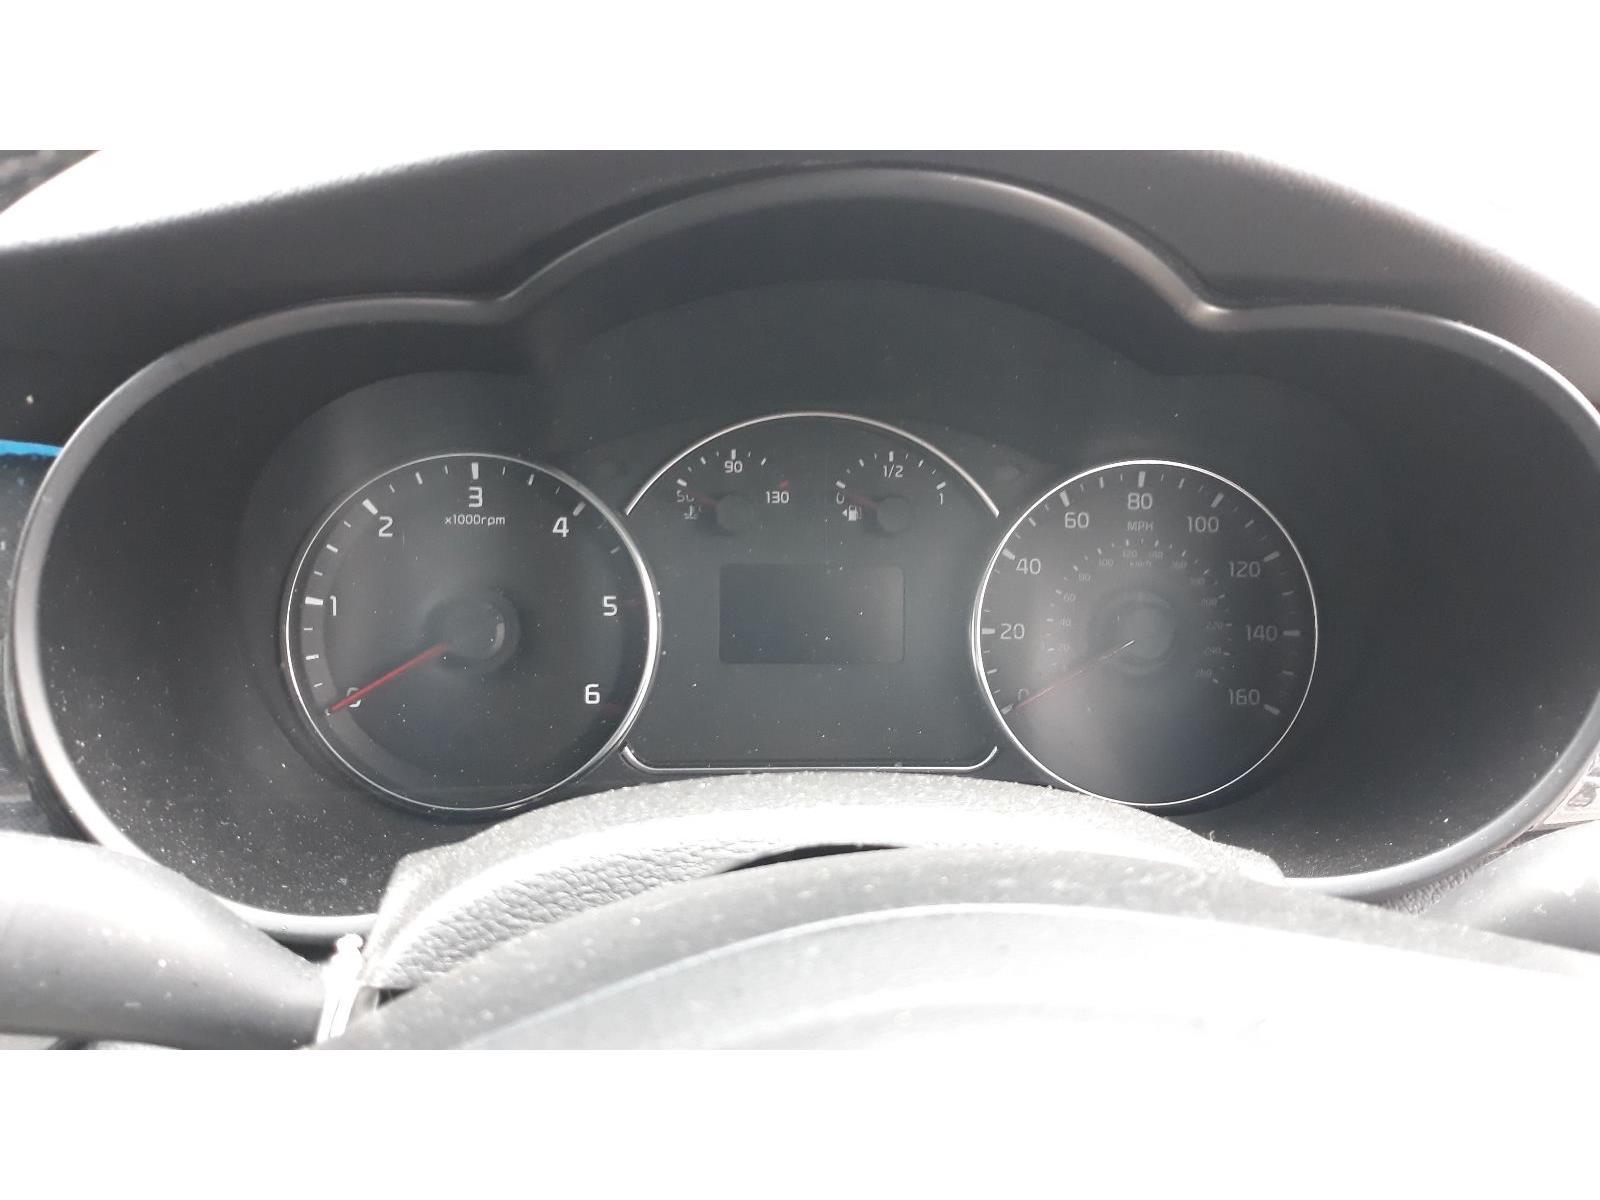 Kia Carens 2013 To 2016 3 Sat Nav Crdi Ecodynamics Mpv Scrap Fuse Box Location Salvage Car For Sale Auction Silverlake Autoparts